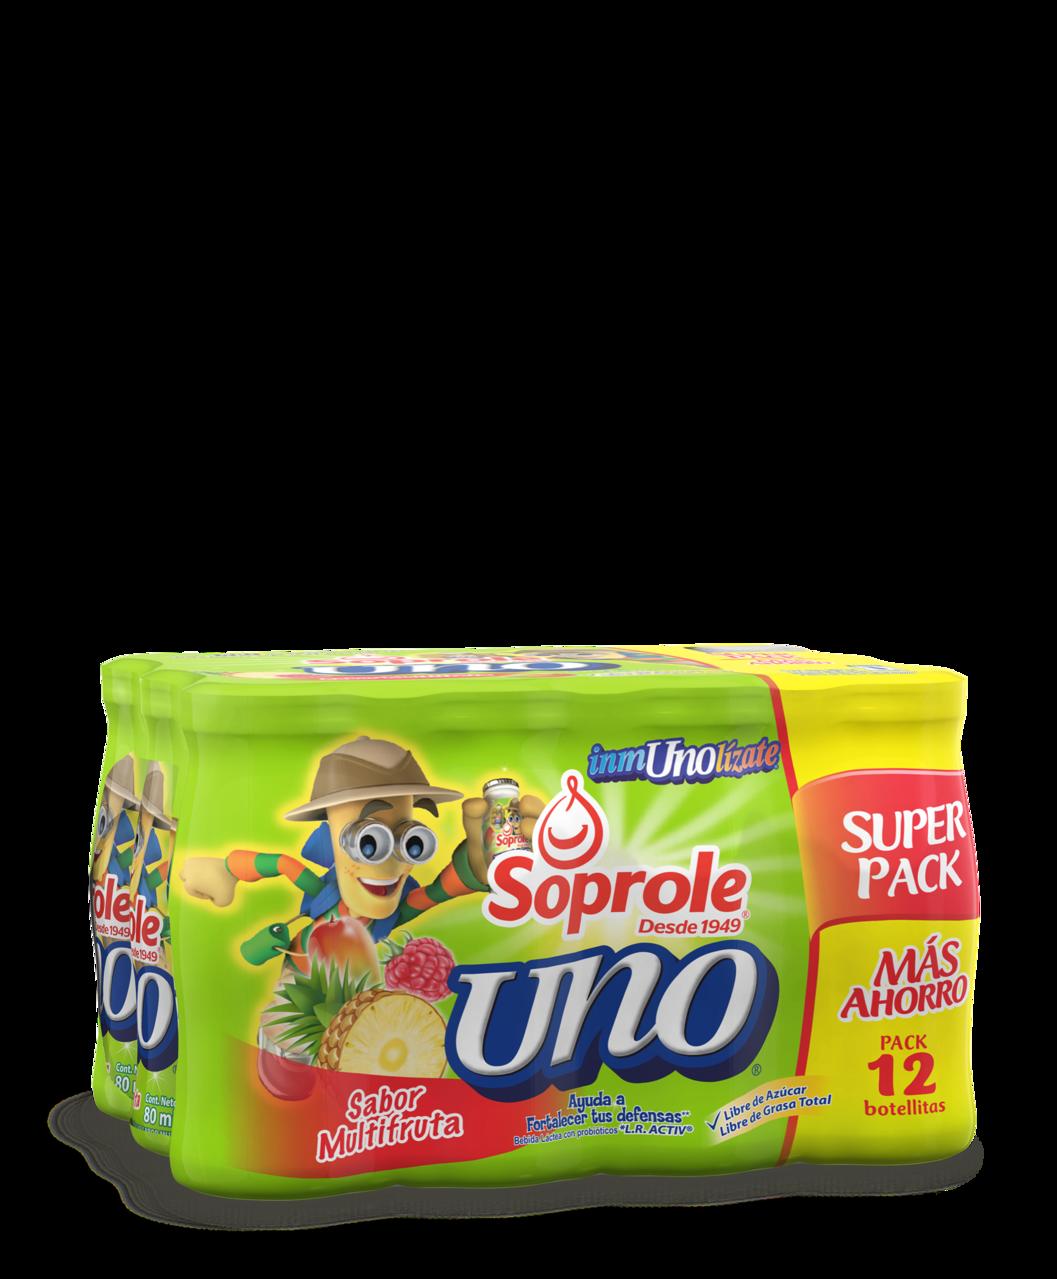 Soprole uno sabor multifruta pack 12